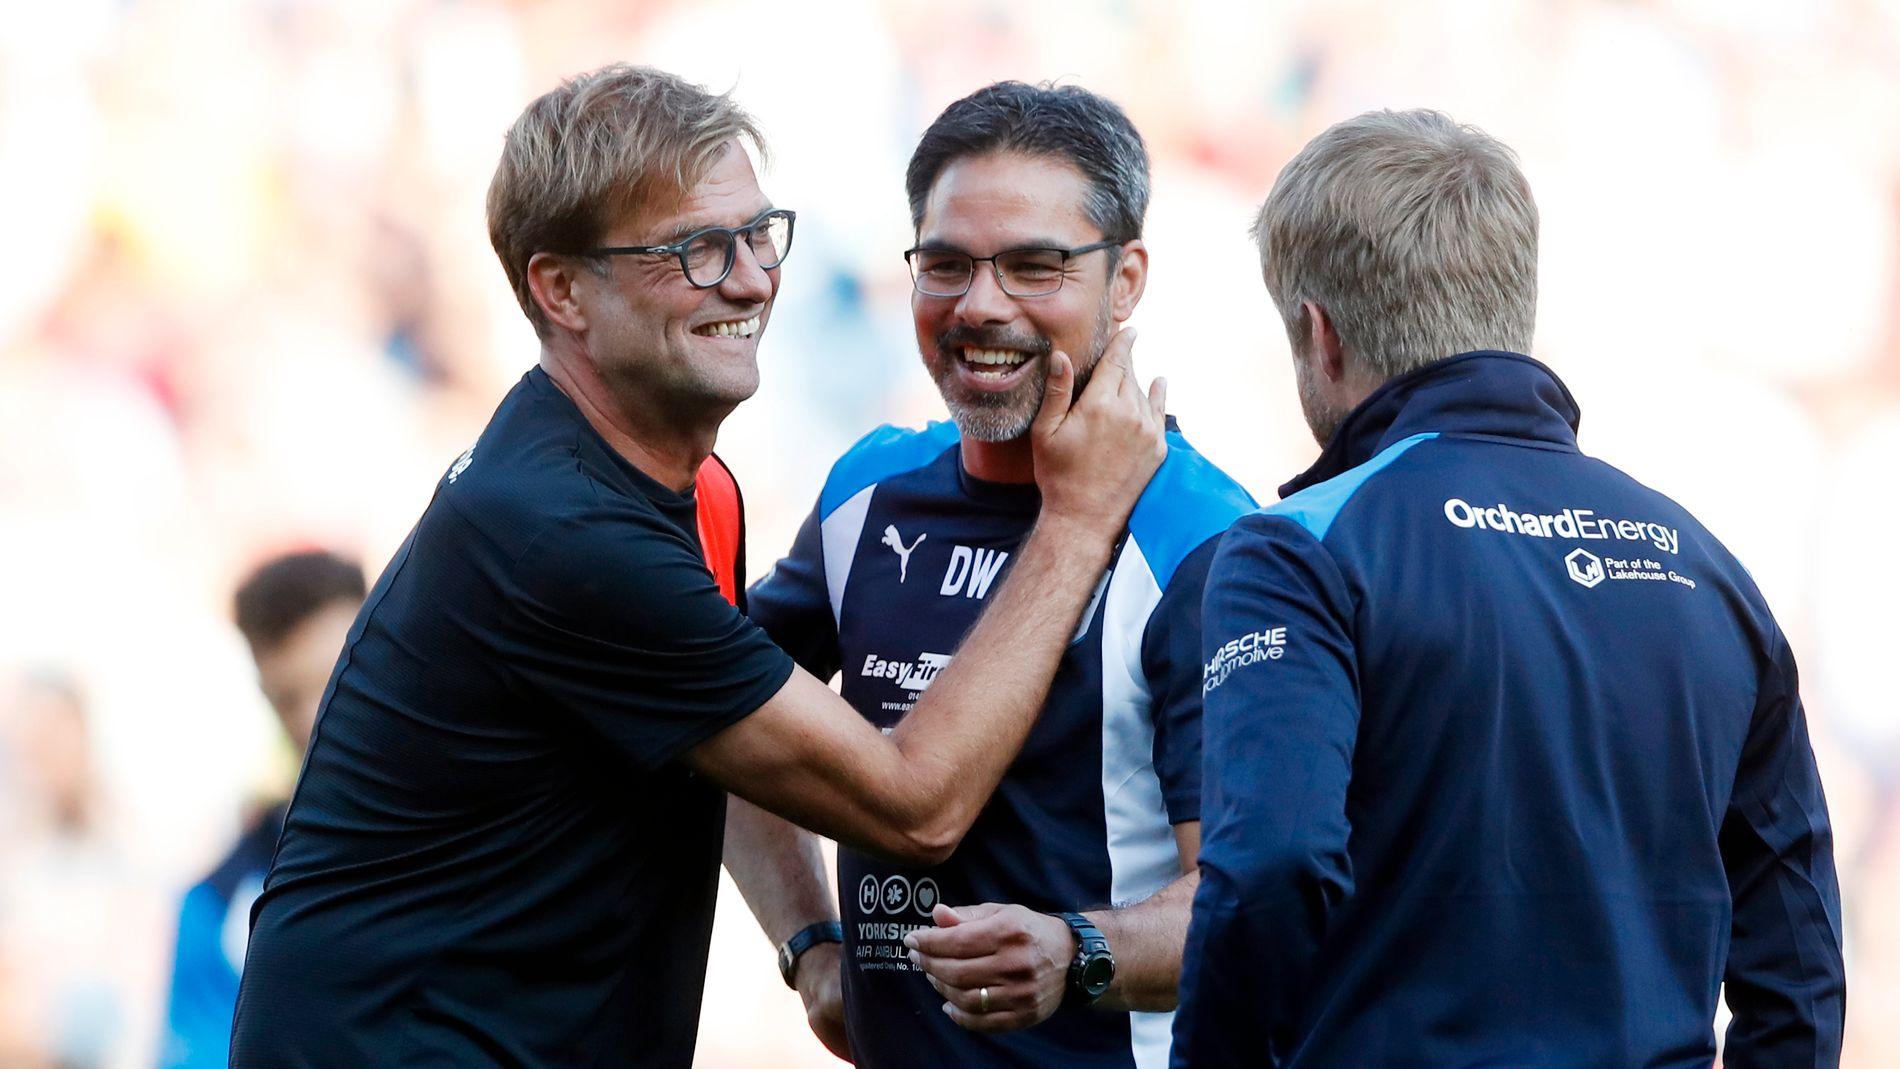 GODE VENNER: Jürgen Klopp takker kompisen David Wagner for kampen etter at Huddersfield hadde slått Liverpool 2-0 i en treningskamp i juli.